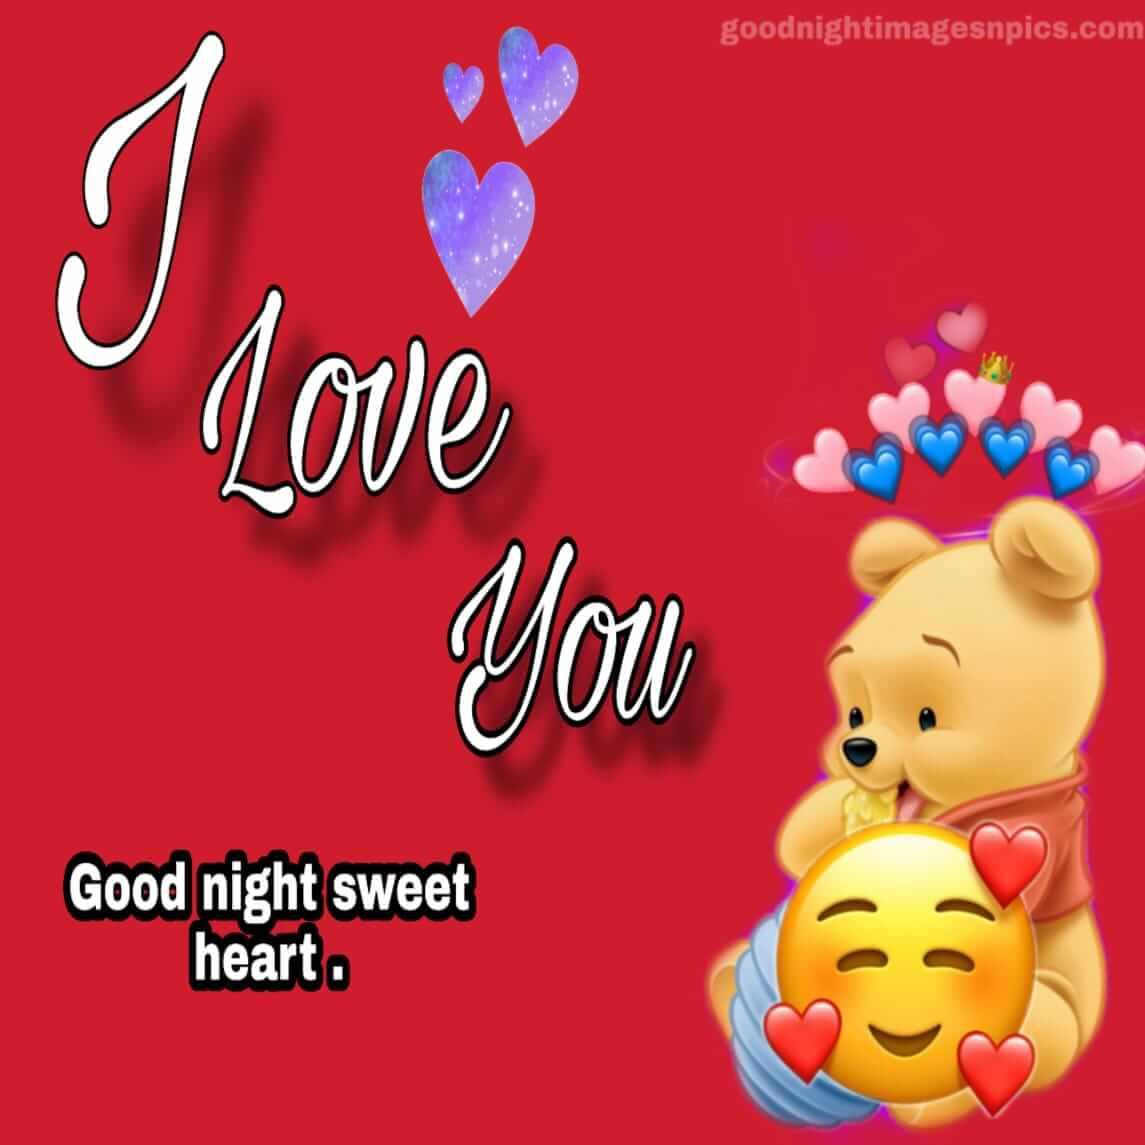 Good Night Photo For Love